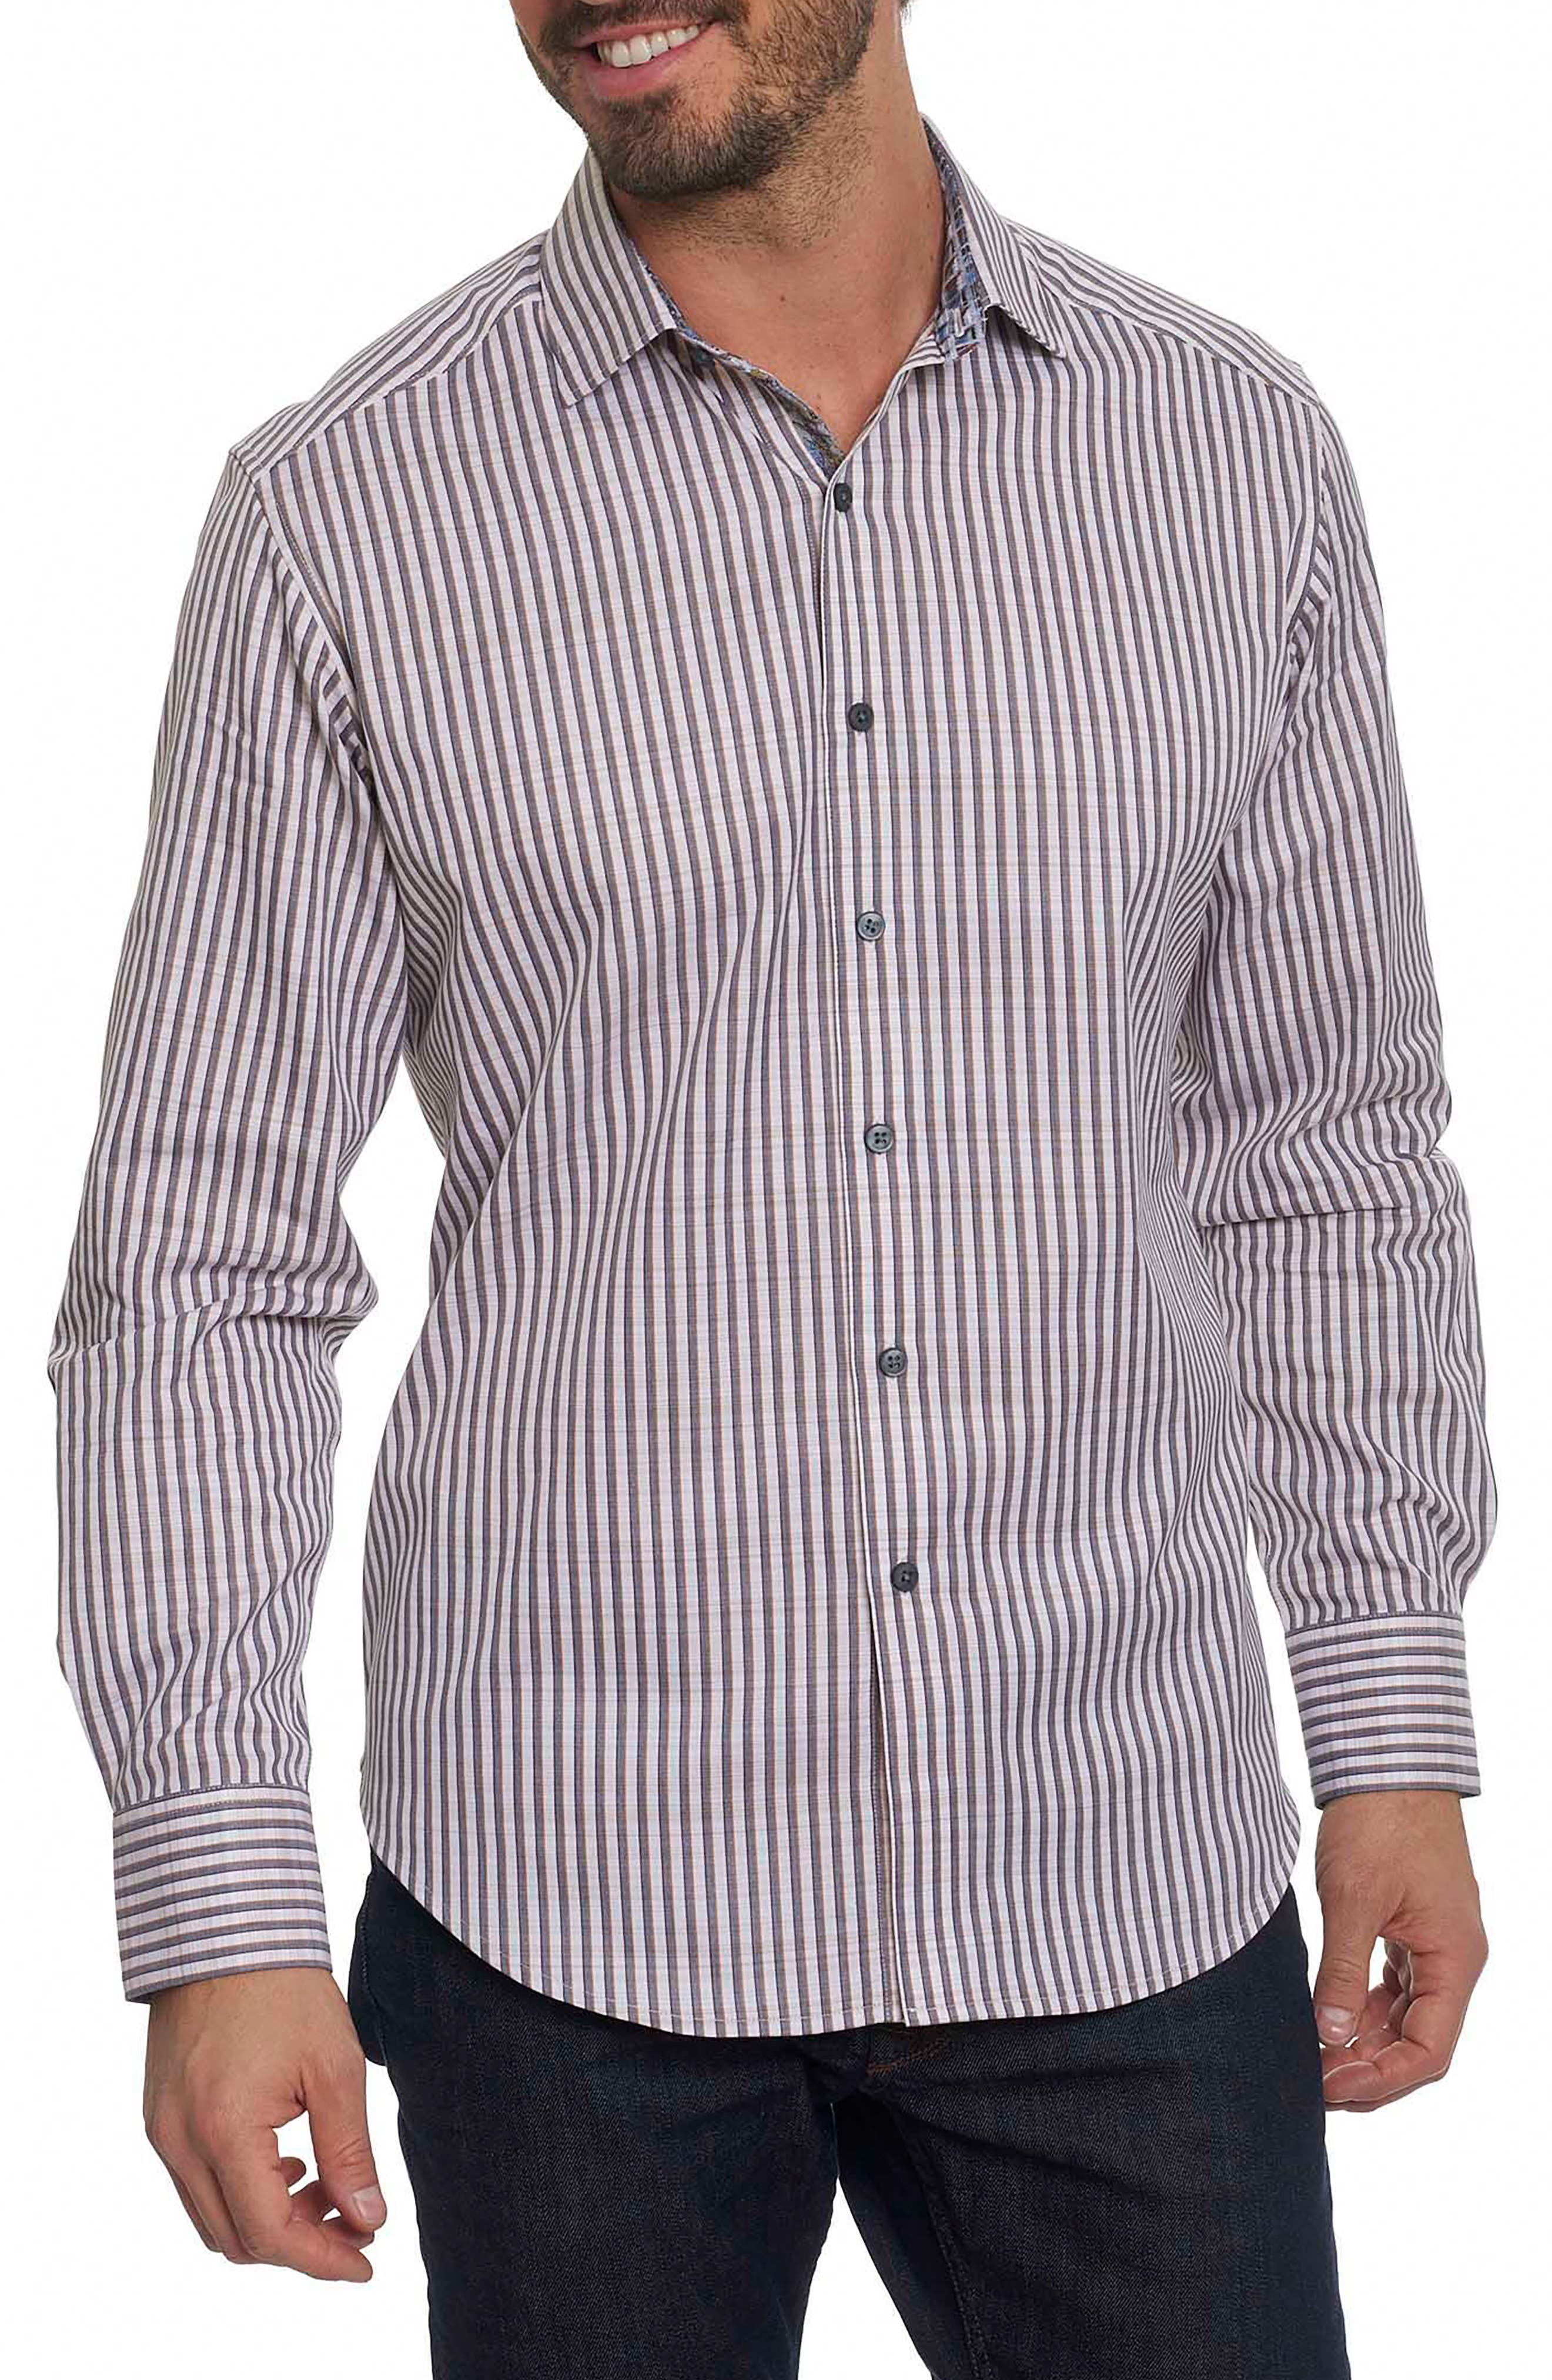 Main Image - Robert Graham Marion Classic Fit Stripe Shirt